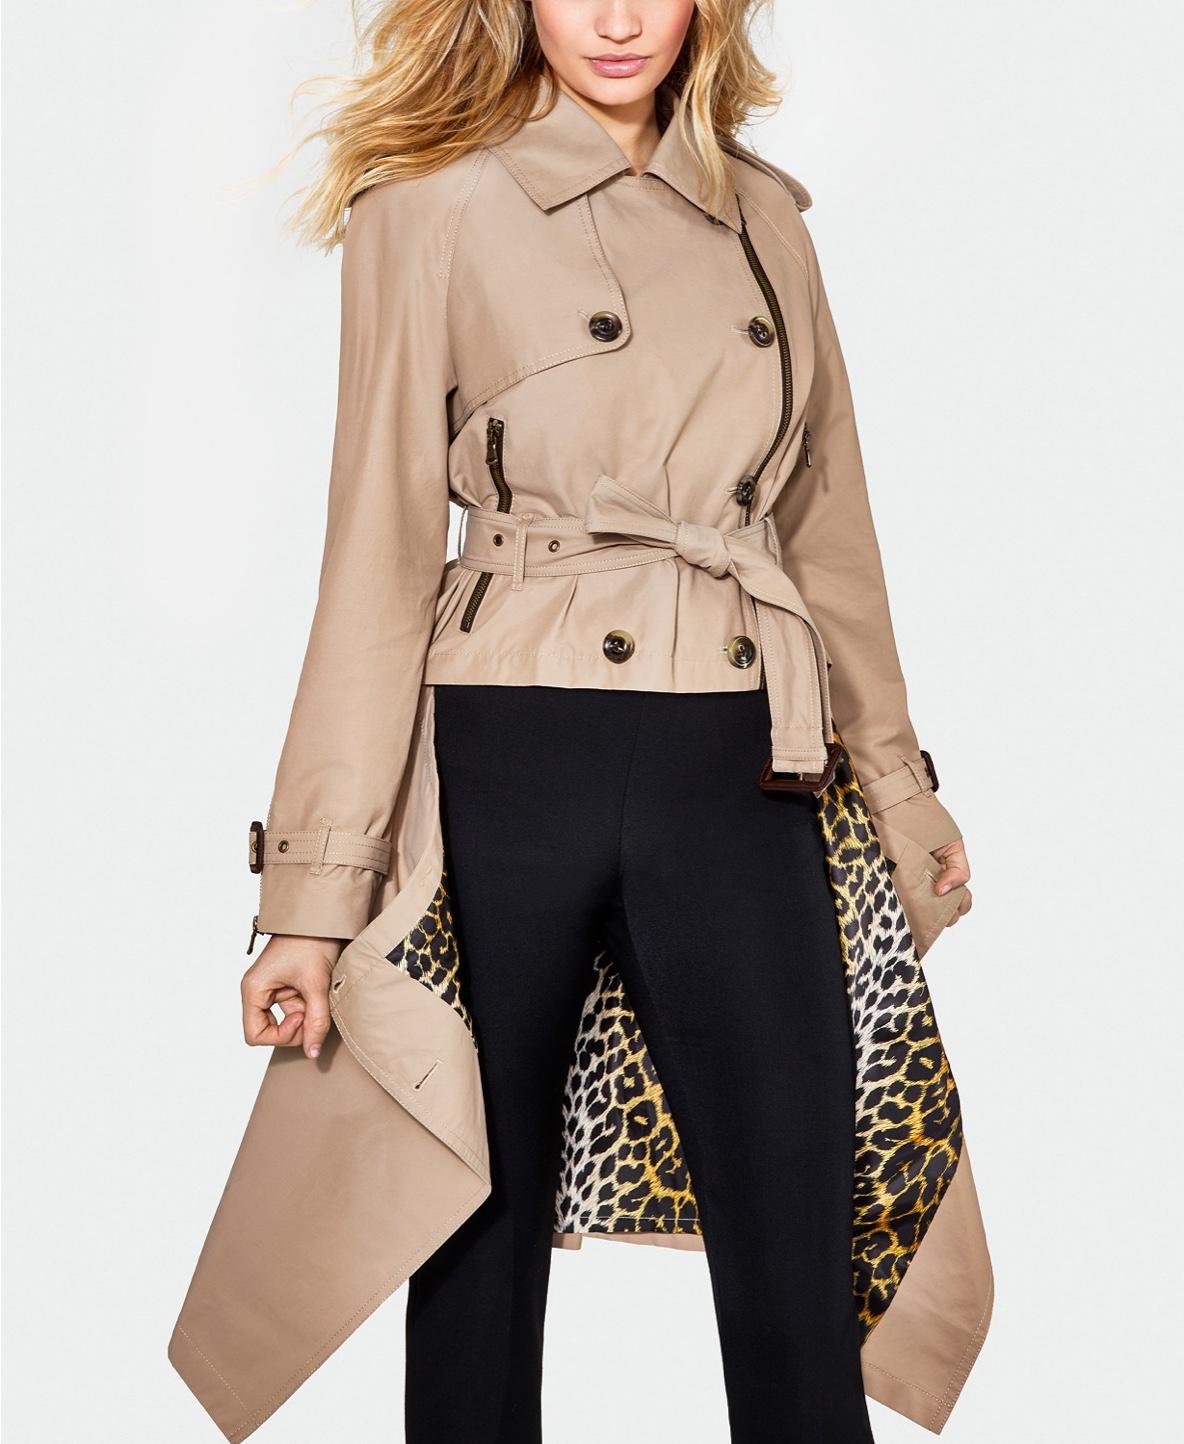 London Fog x Jeremy Scott Women's Raincoat $298